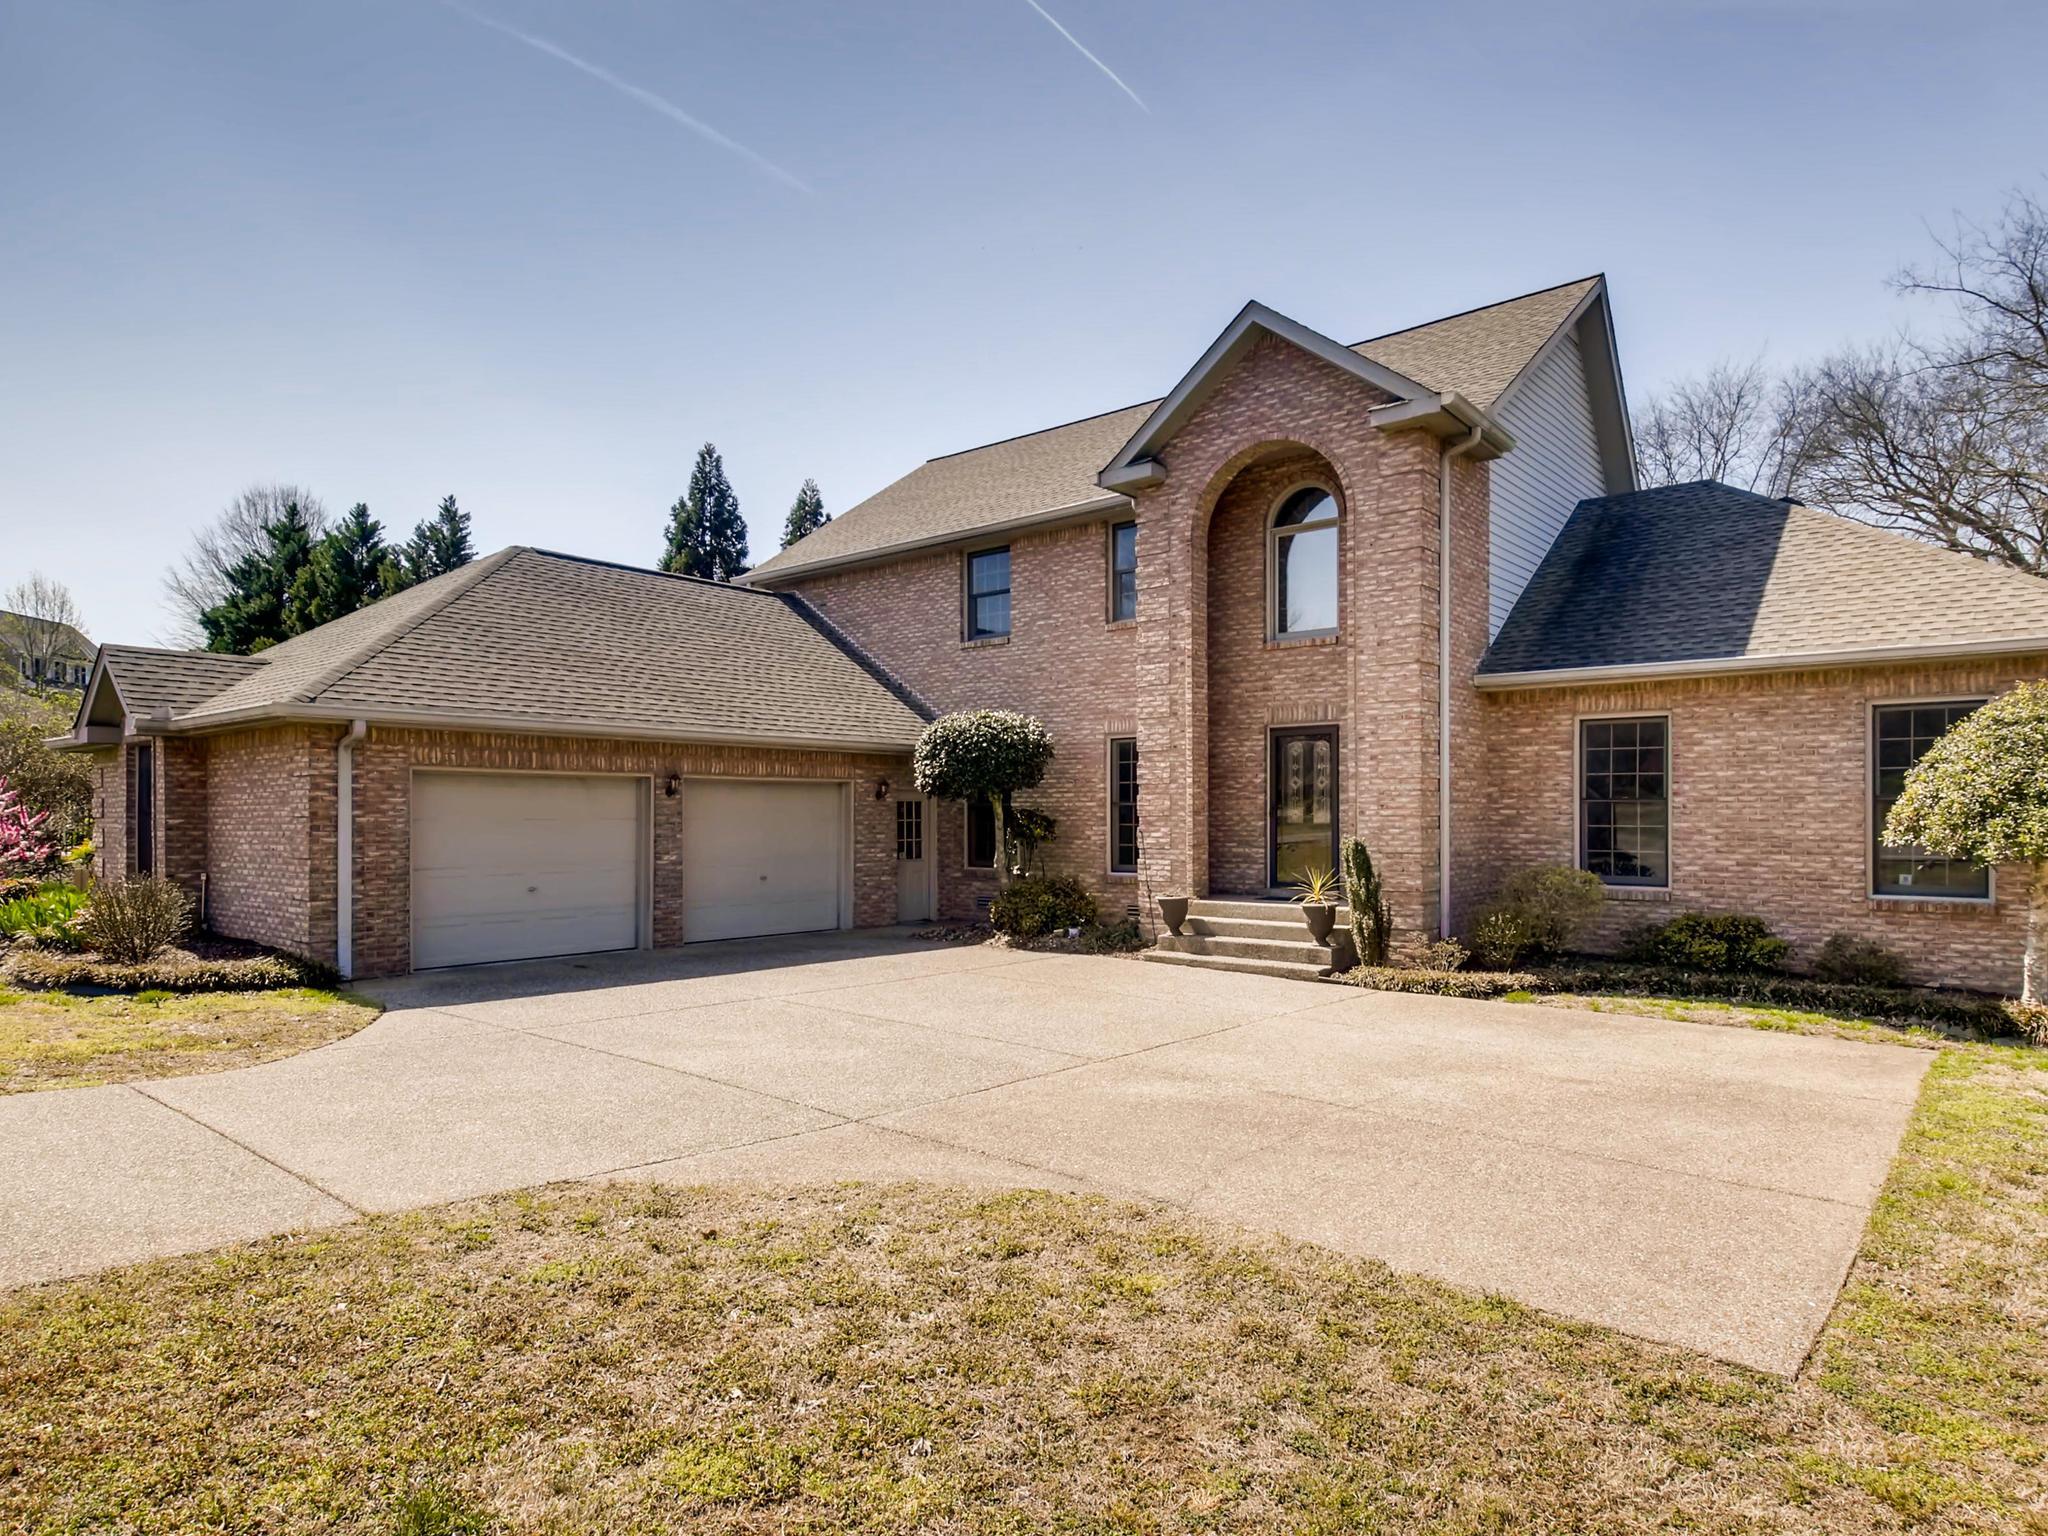 104 Dekewood Dr, Old Hickory, TN 37138 - Old Hickory, TN real estate listing